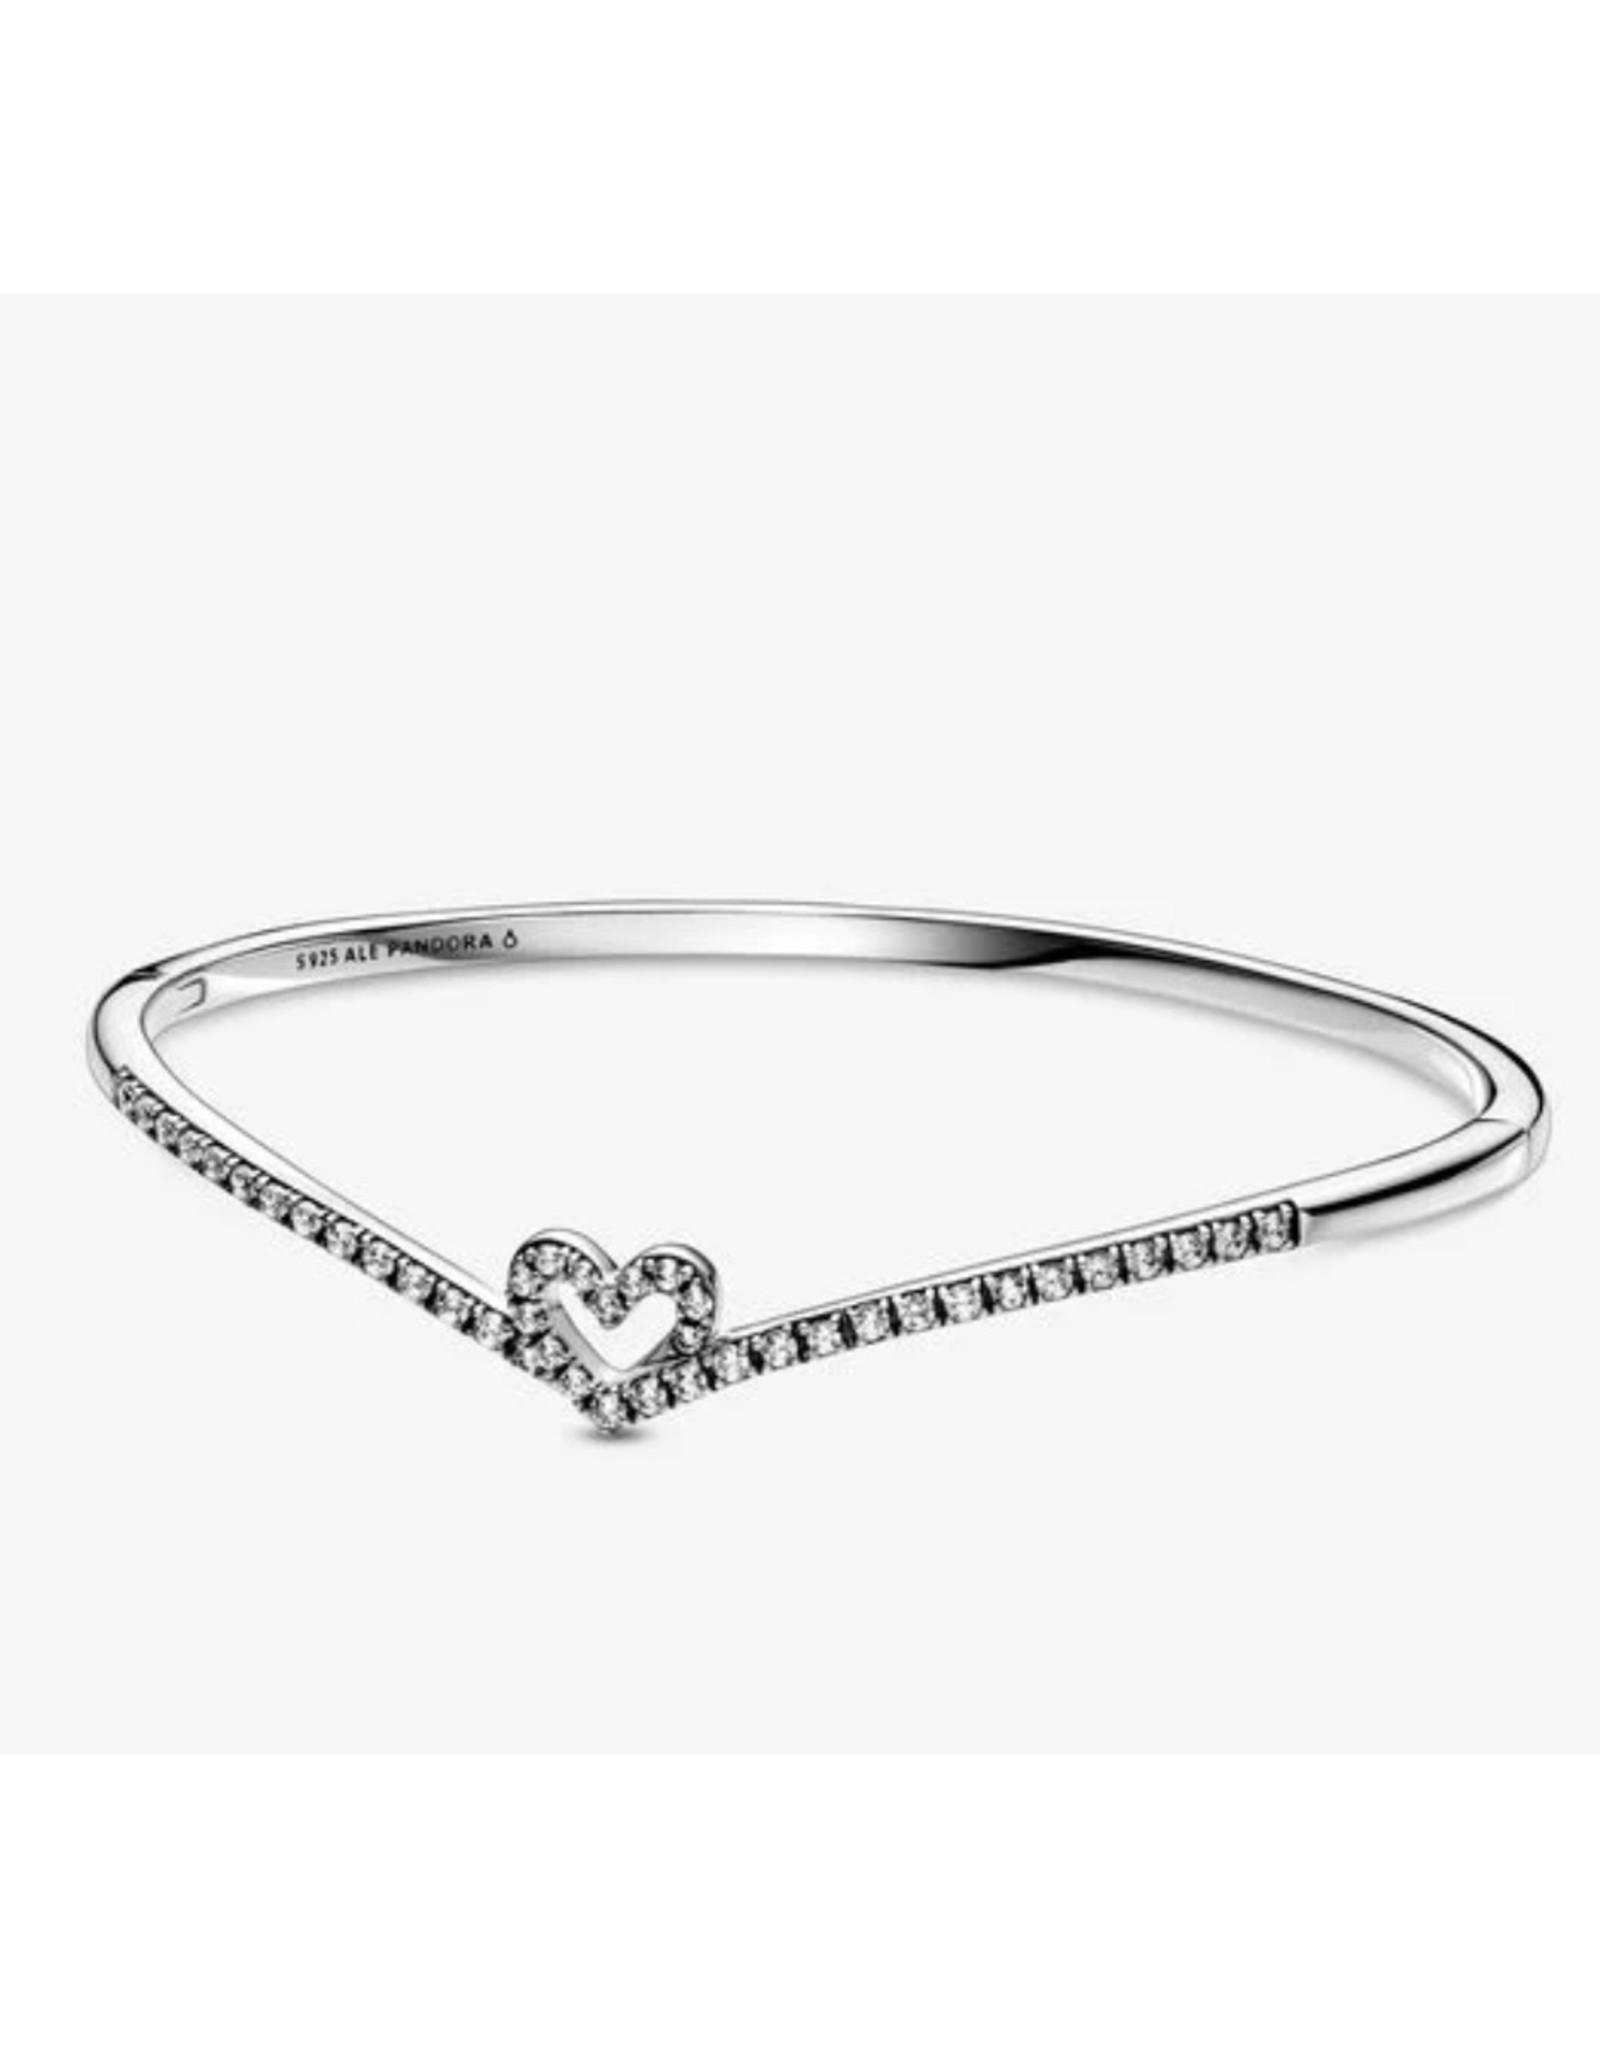 Pandora Pandora Bracelet,599297C01, Sparkling Wishbone Heart Bangle, Clear CZ